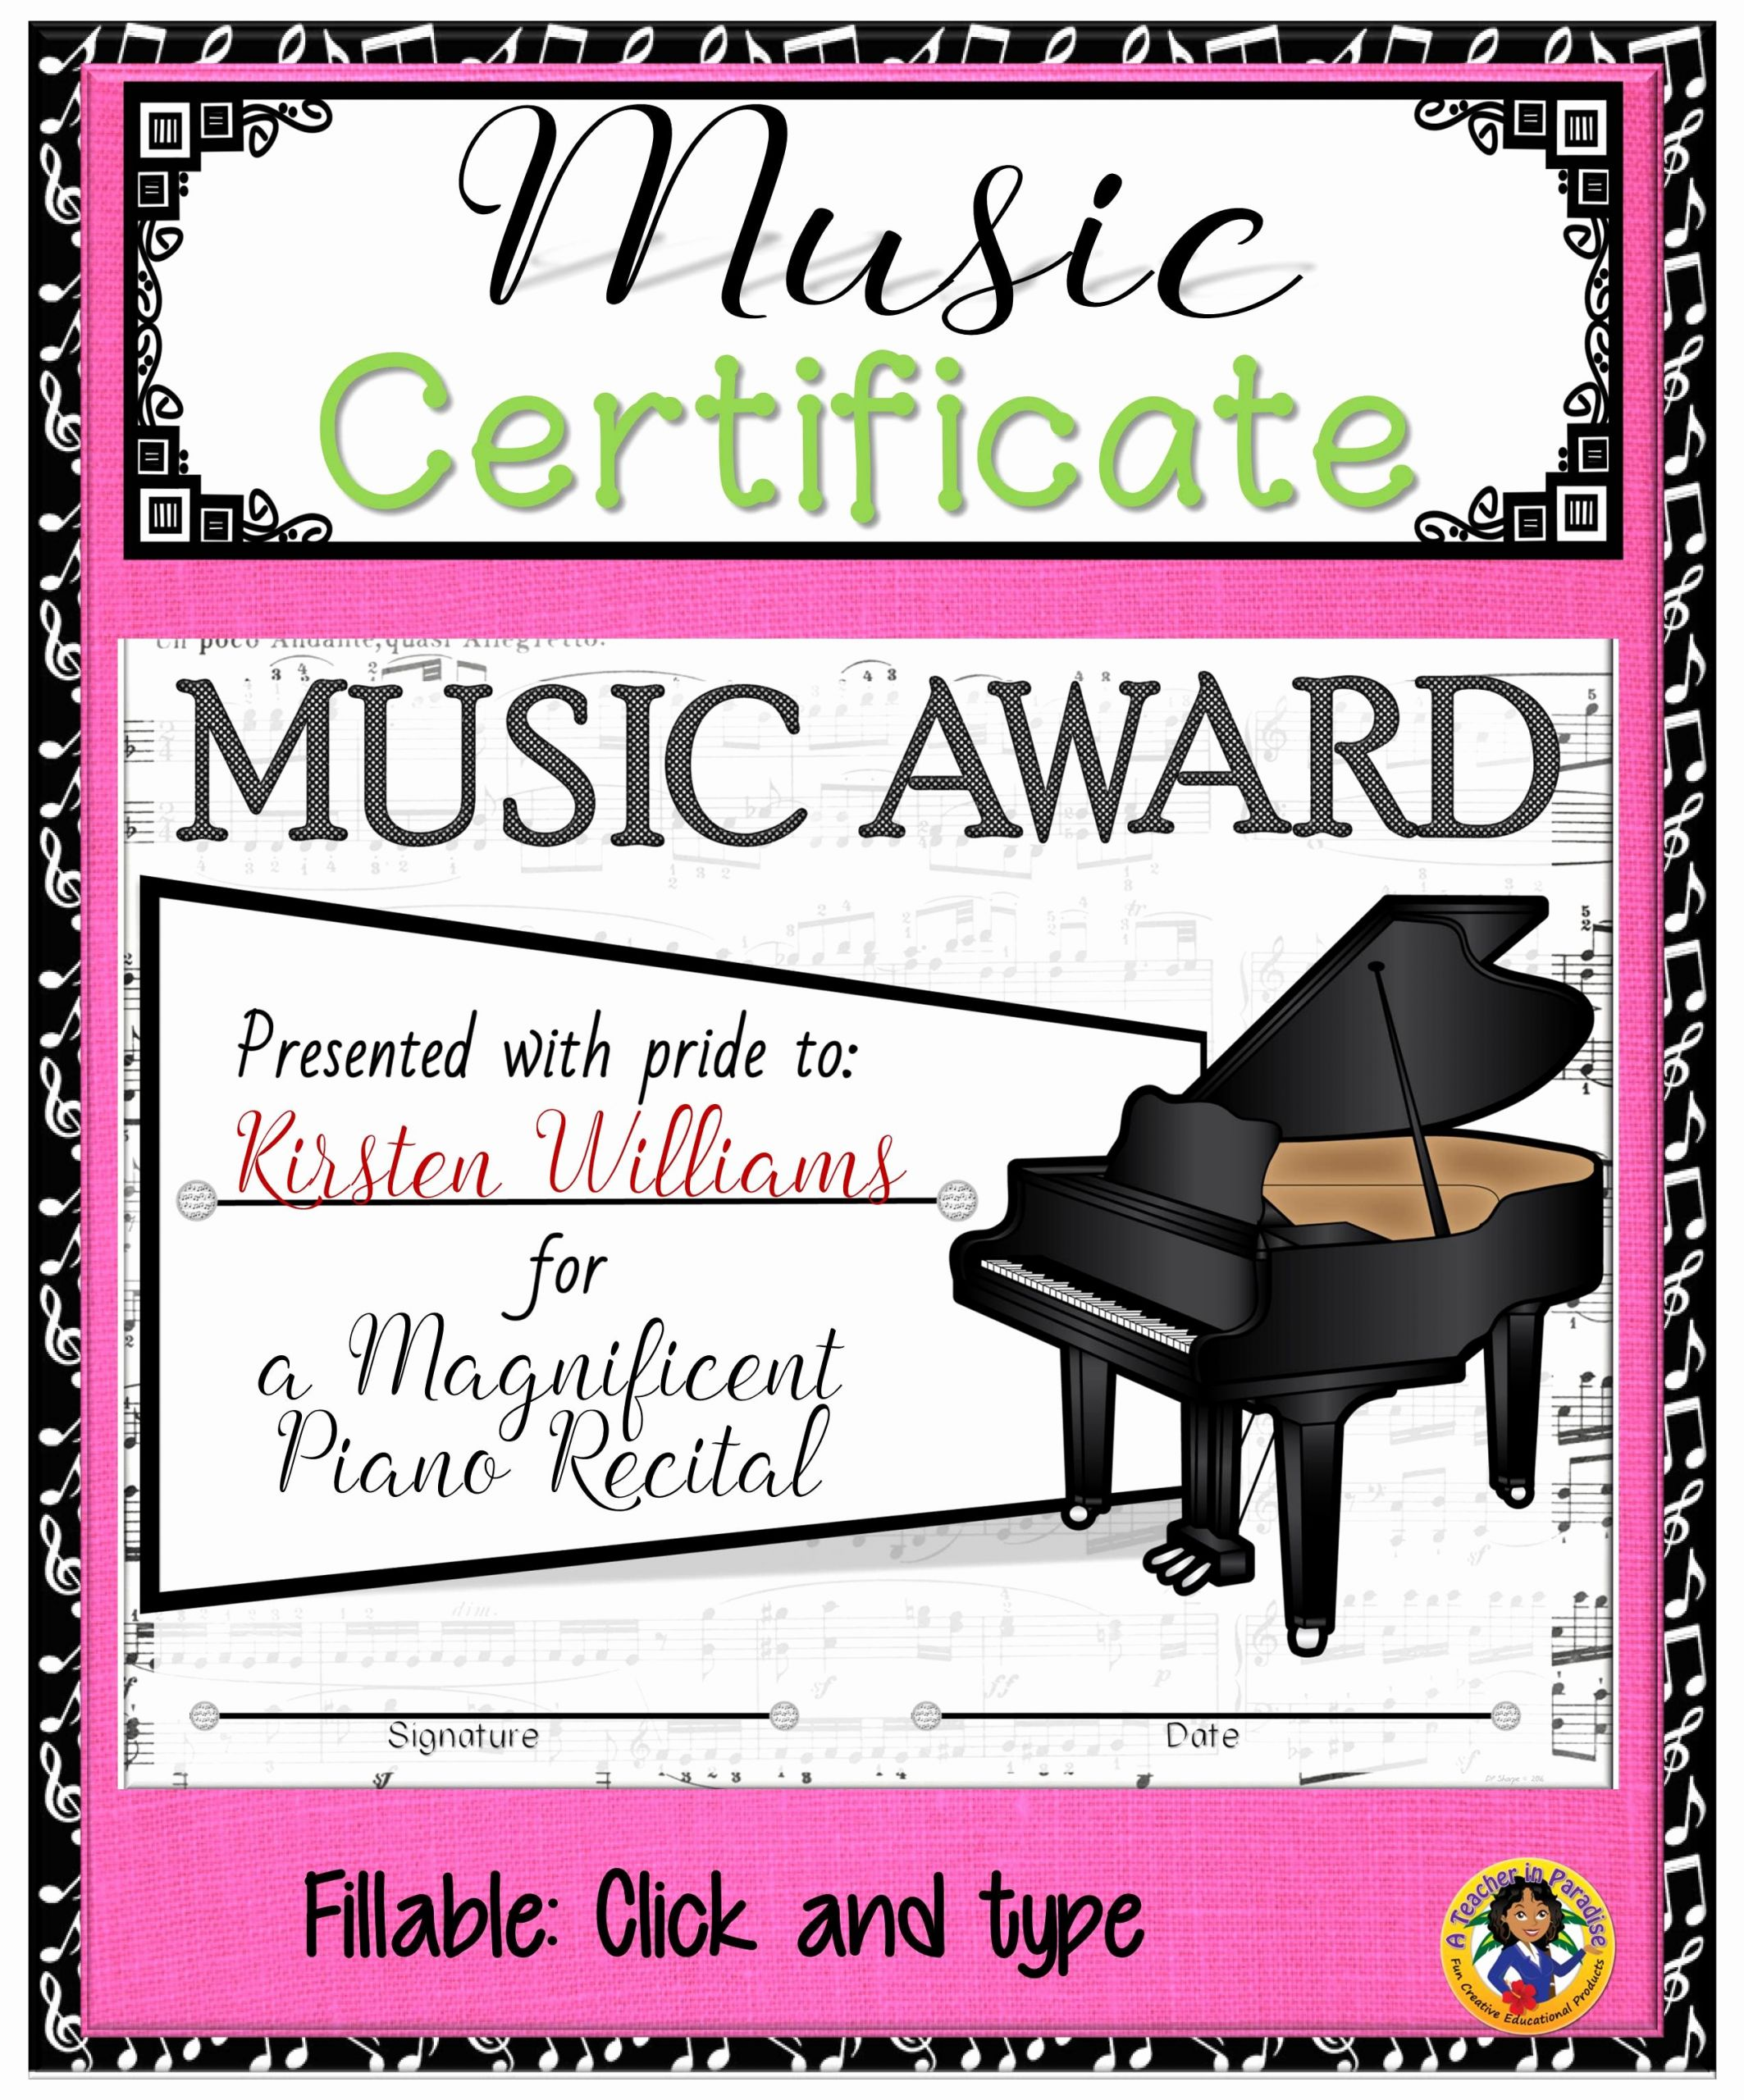 Job Well Done Certificate Best Of Certificate – Music Certificate 2